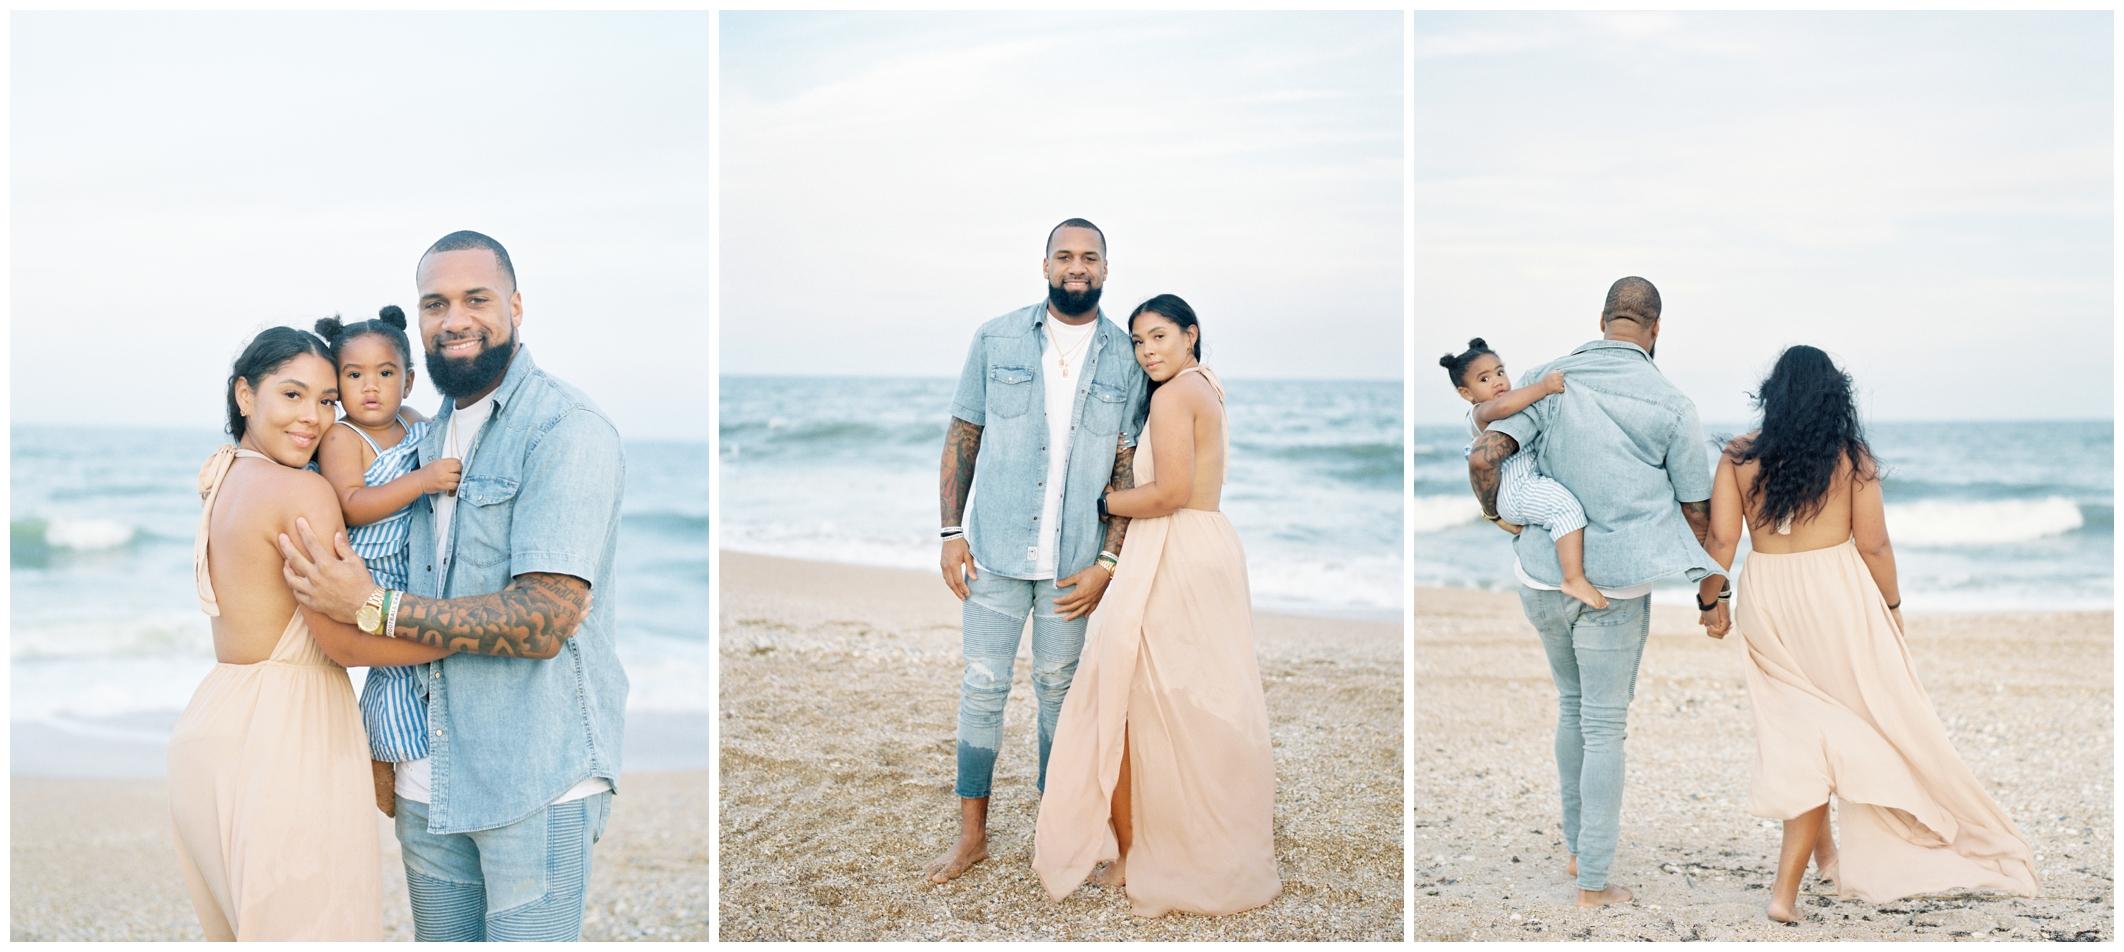 Lisa Silva Photography- Ponte Vedra Beach, St. Augustine and Jacksonville, Florida Fine Art Film Destination Wedding Photography- Family Lifestyle Session at Guana Preserve_0042.jpg